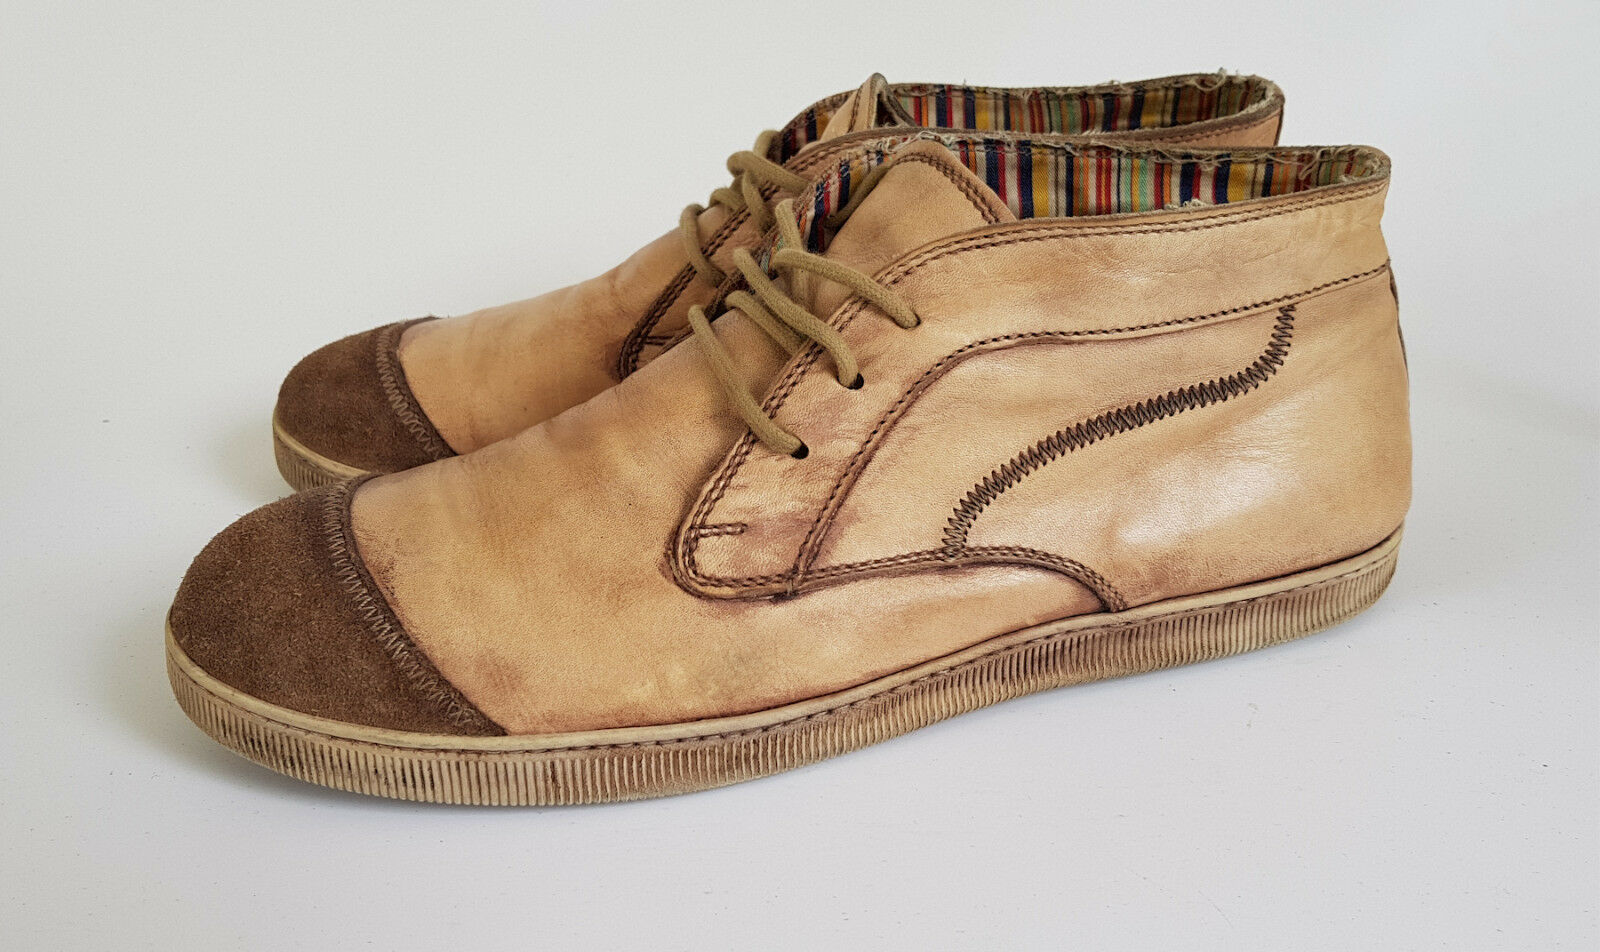 MOMA Herren Leder Stiefeletten Boots High Top Sneaker Braun gr 45